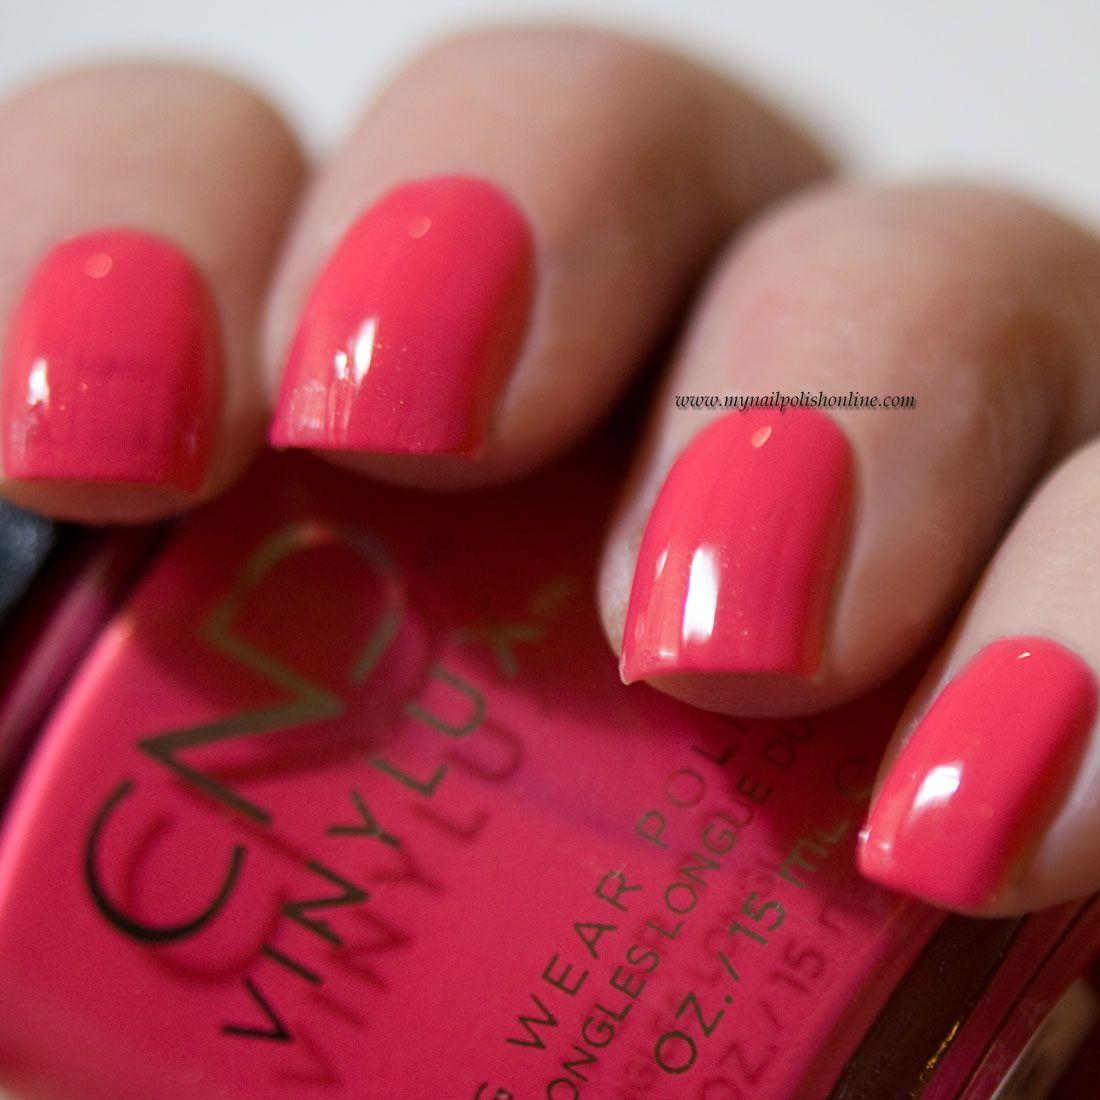 CND Vinylux Charm | My Nail Polish Online | Cnd vinylux, Nail polish ...